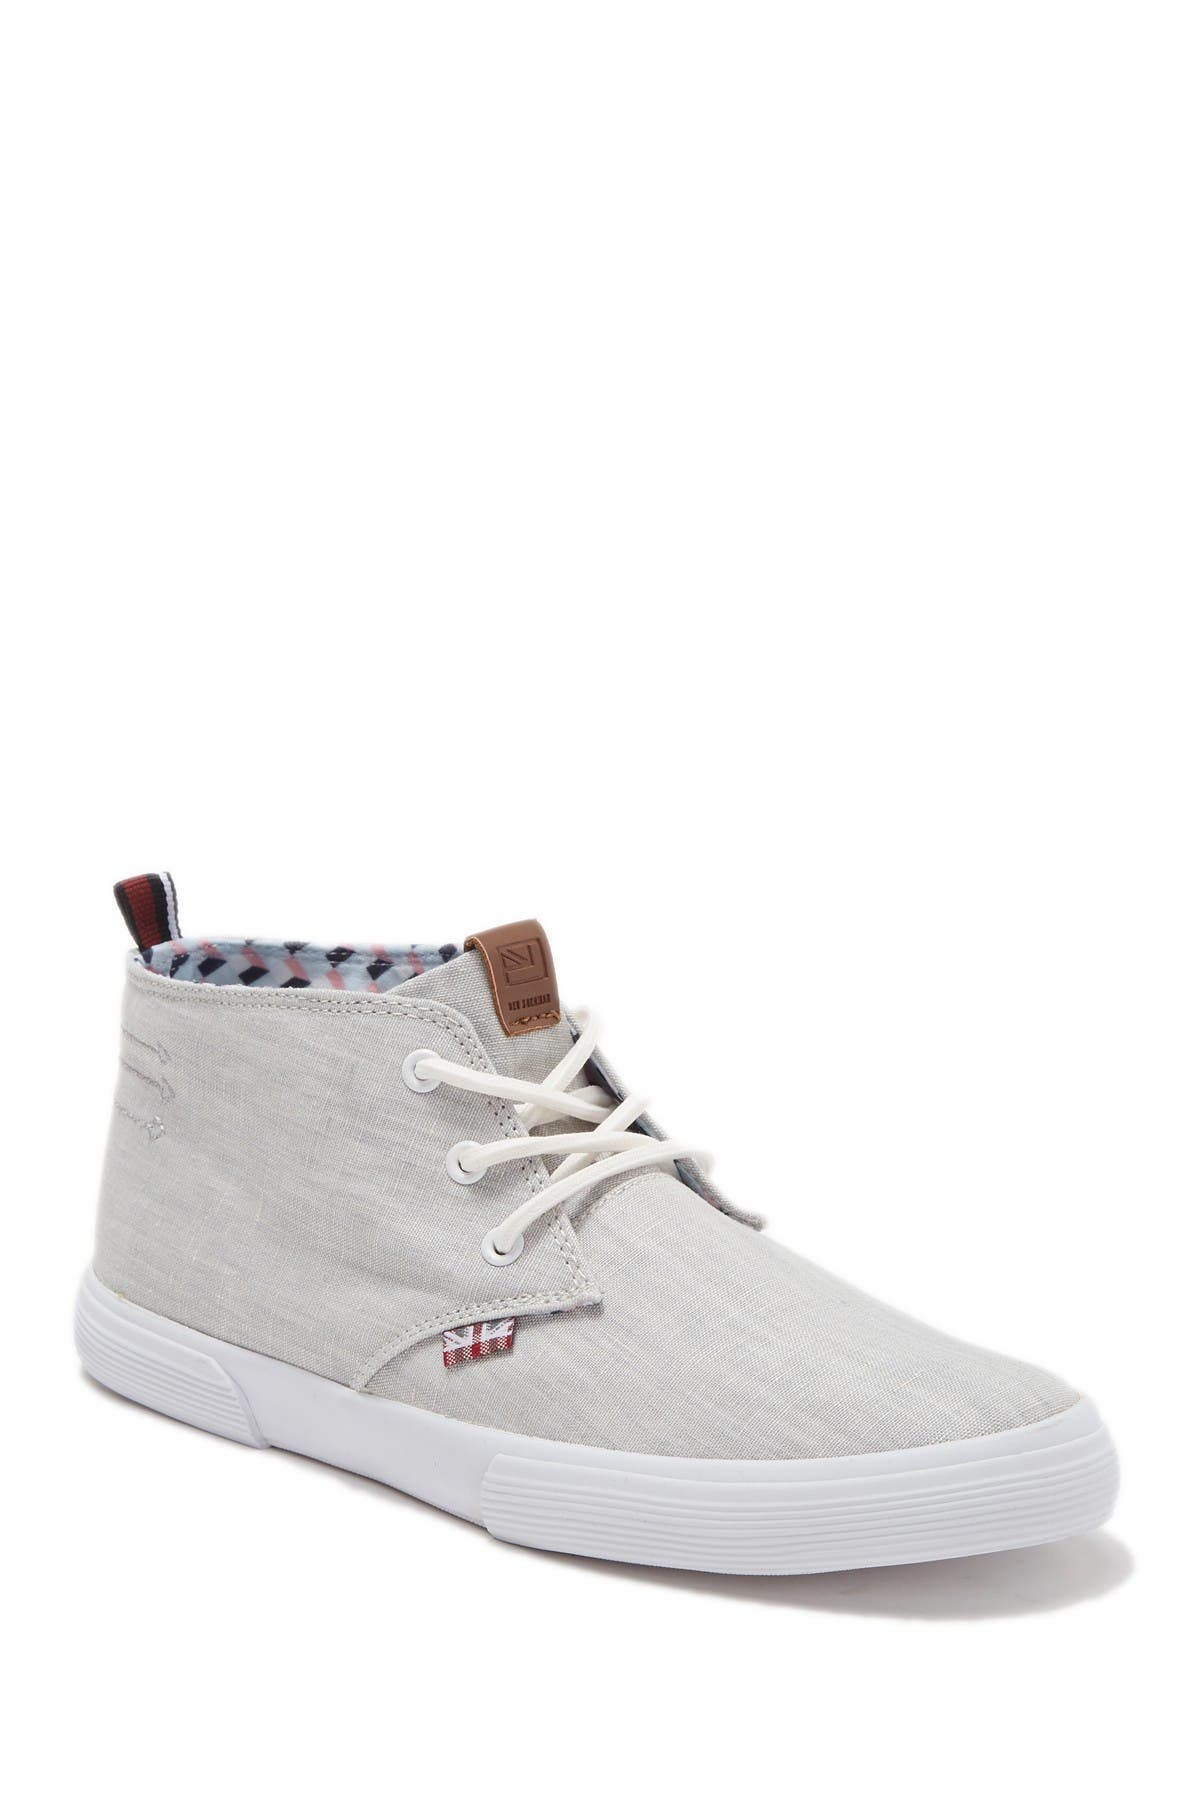 Ben Sherman | Bristol Chukka Sneaker